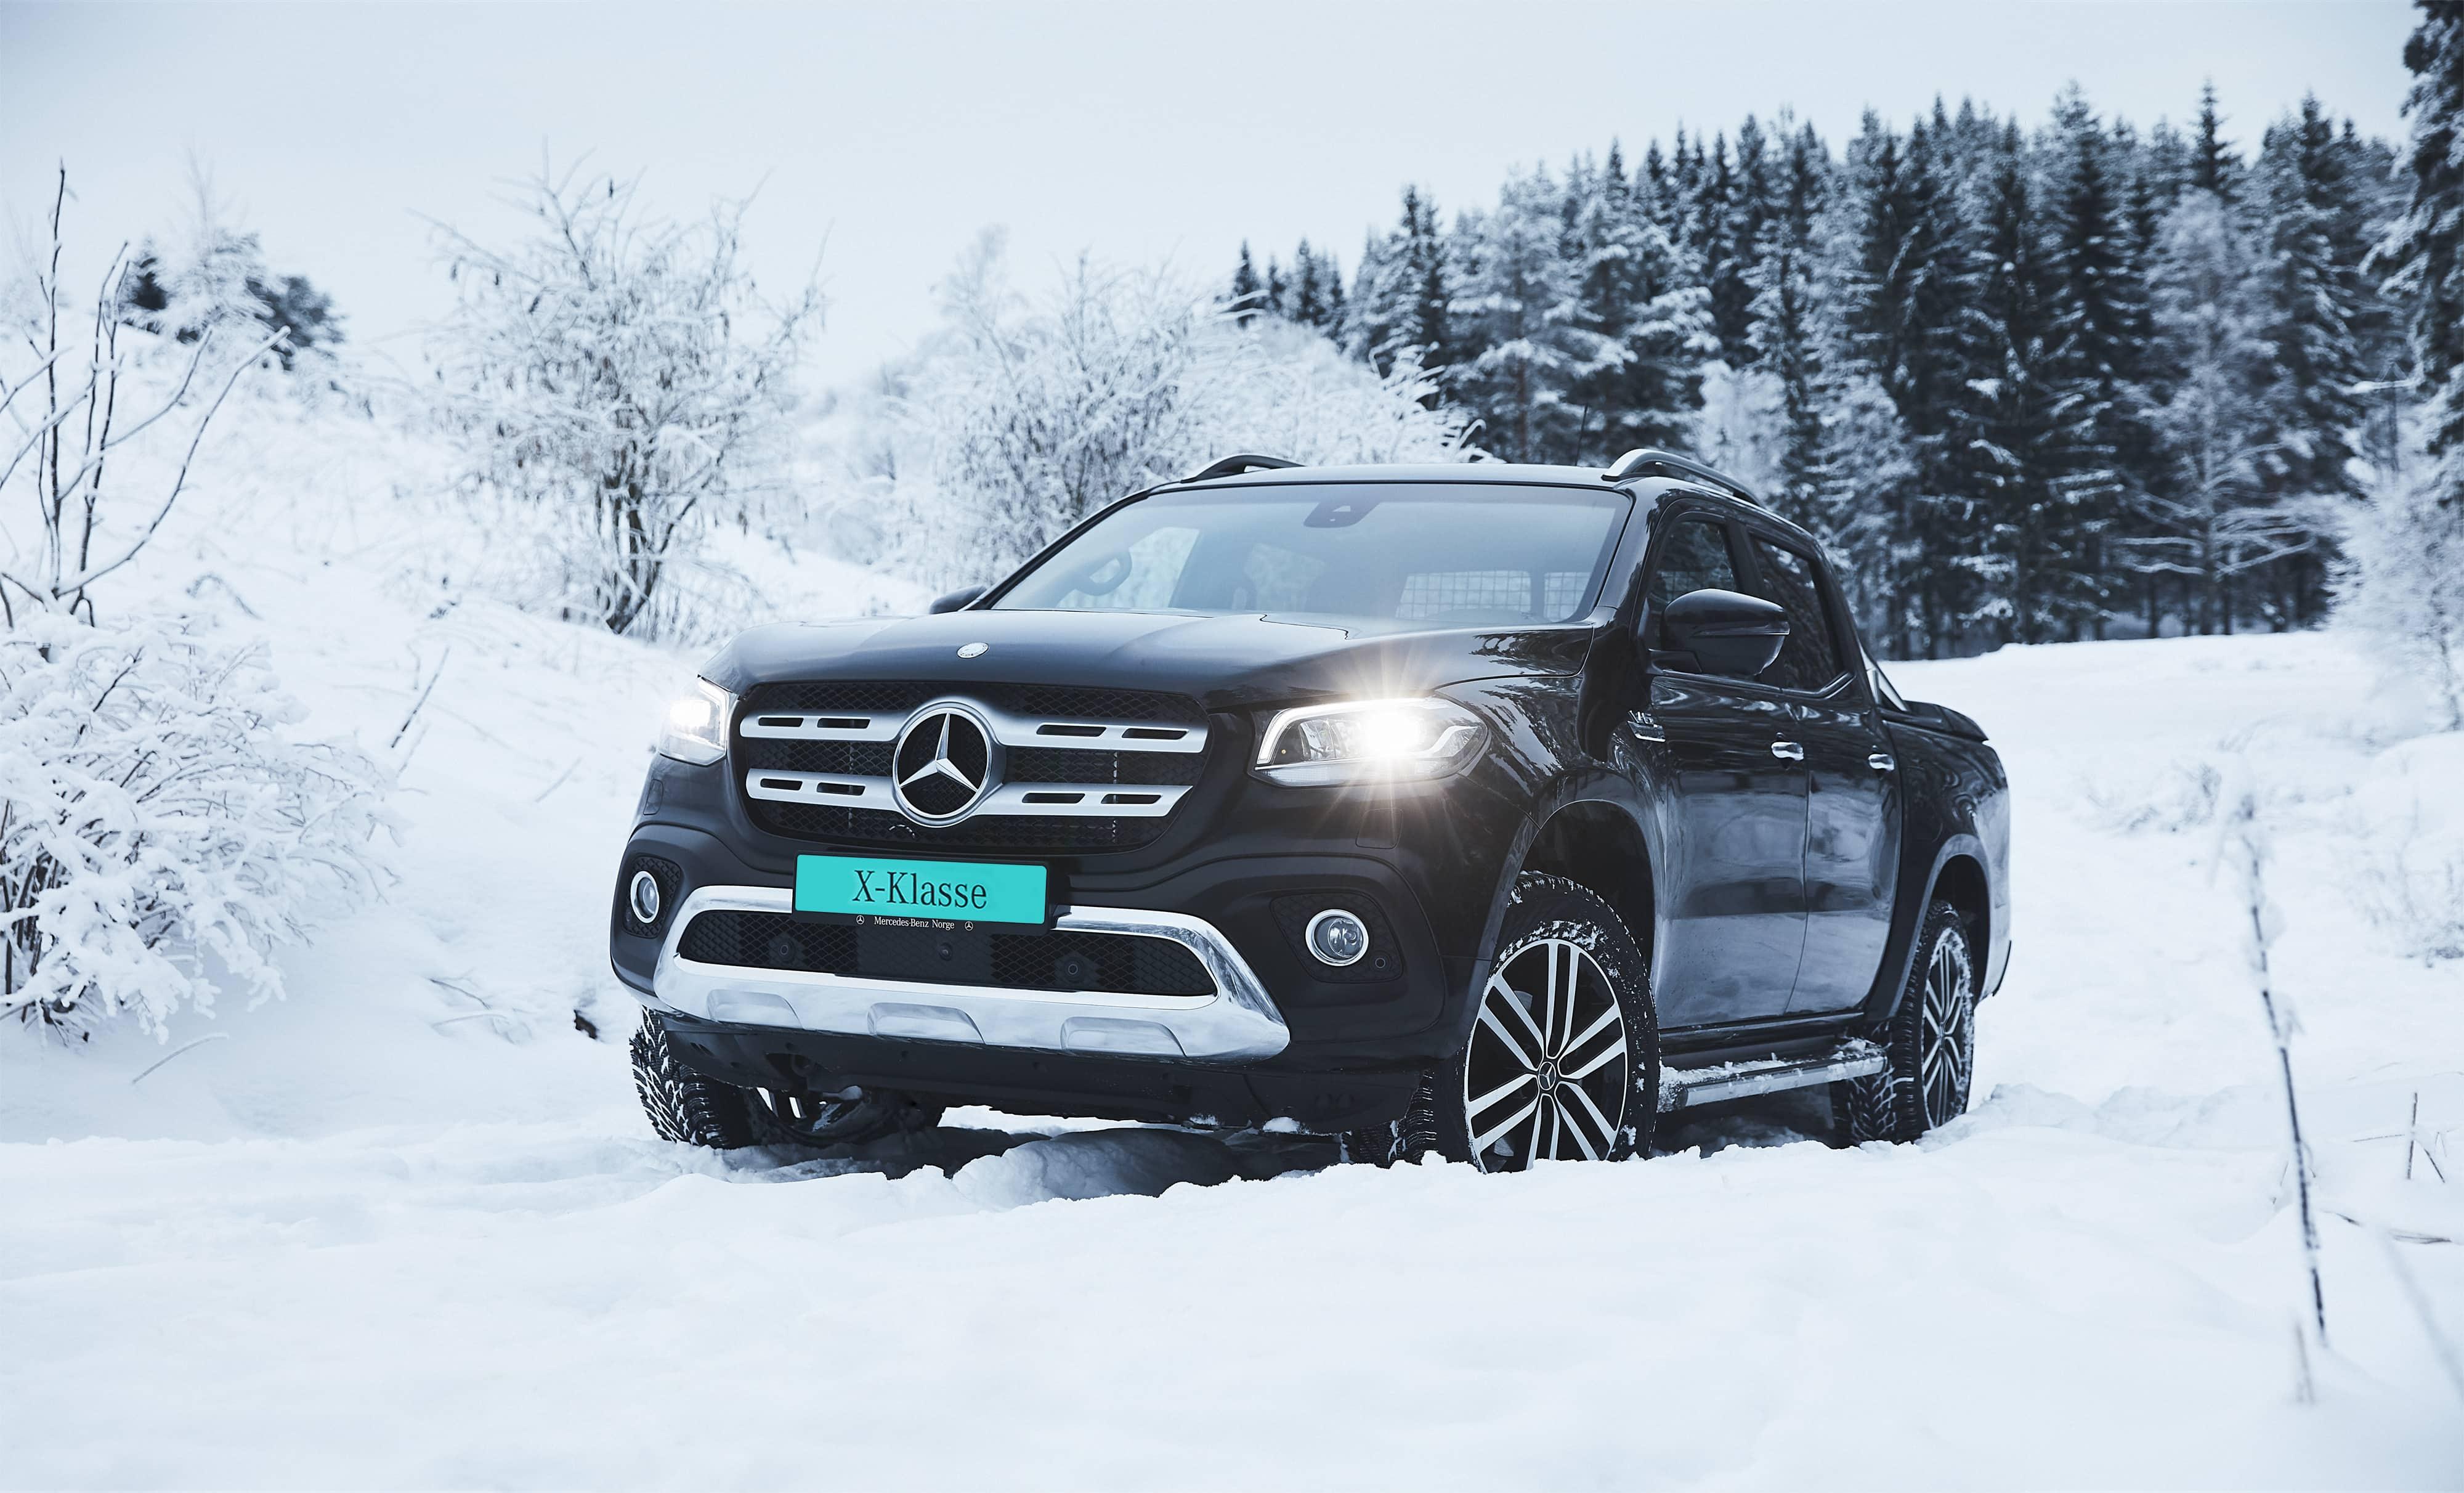 Andreas Kleiberg – Mercedes Benz